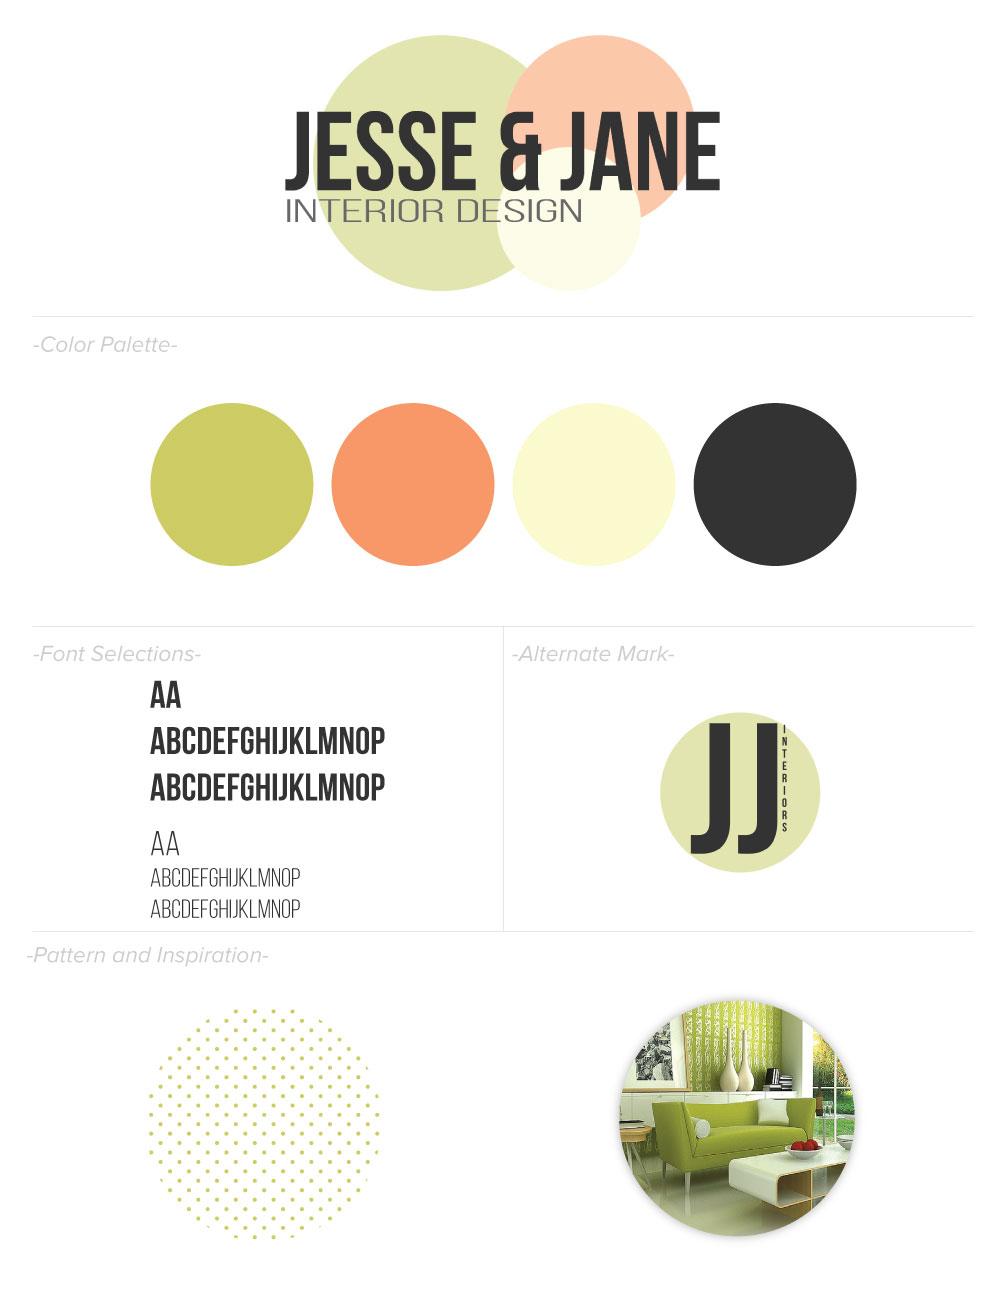 Branding Style Board Design